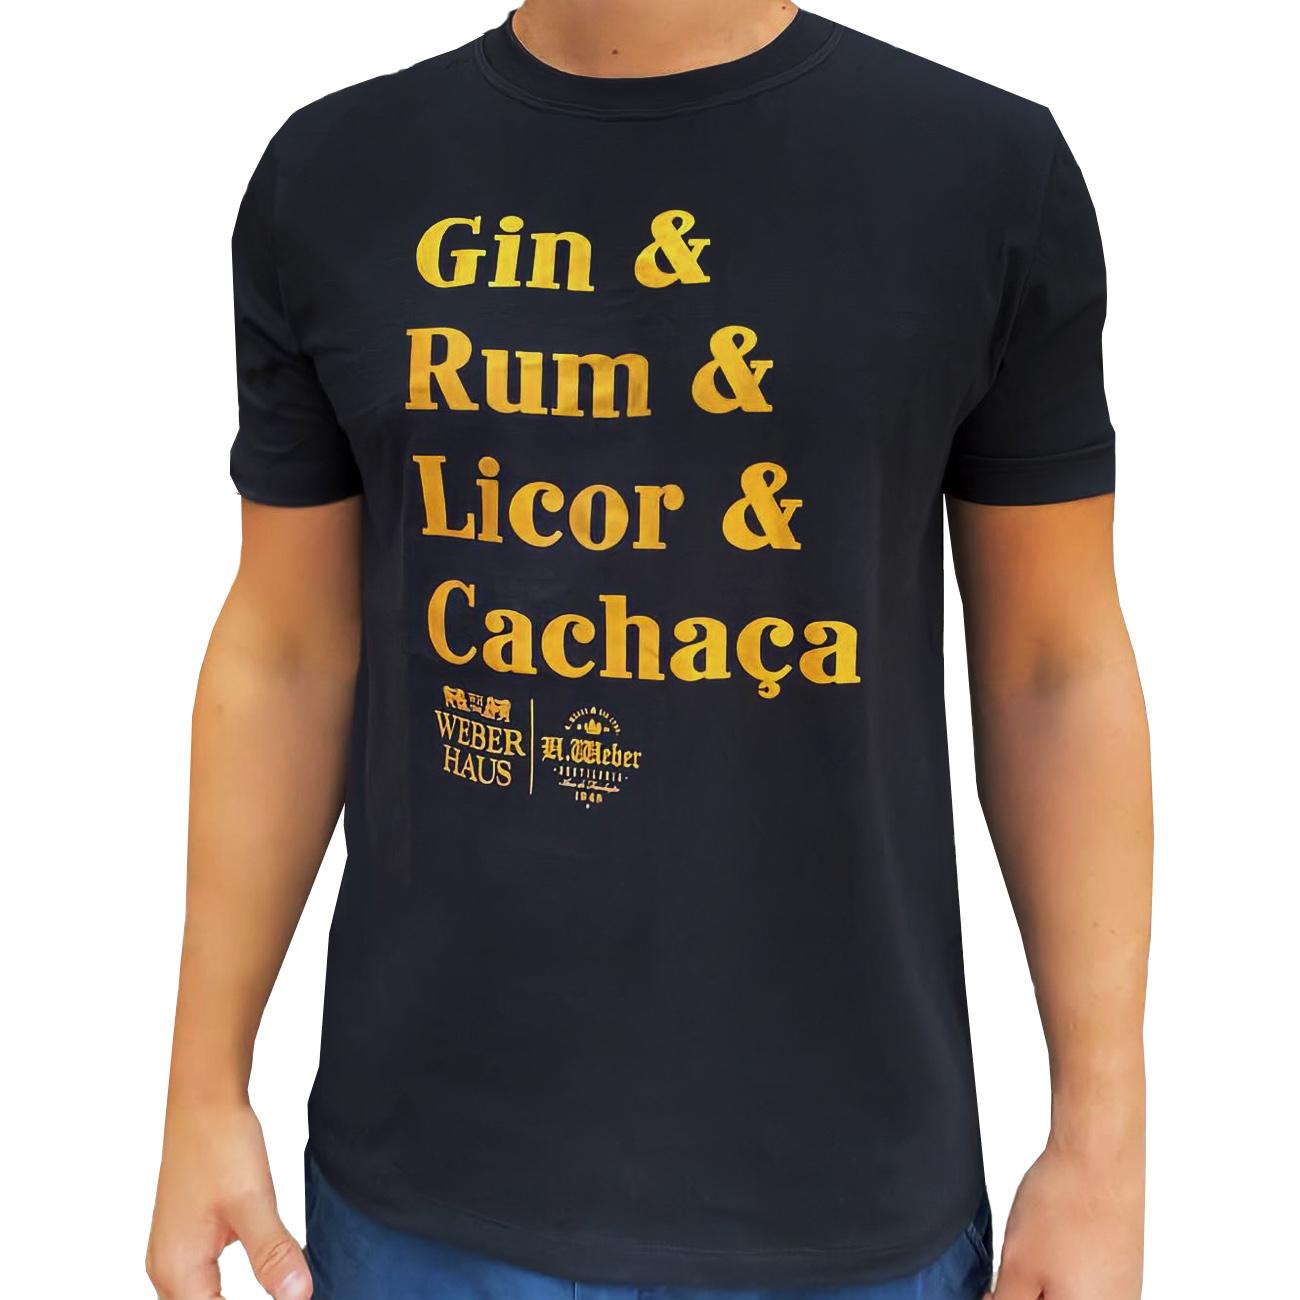 Camiseta Weber Haus Preta - Gin & Rum & Licor & Cachaça - Tamanho G